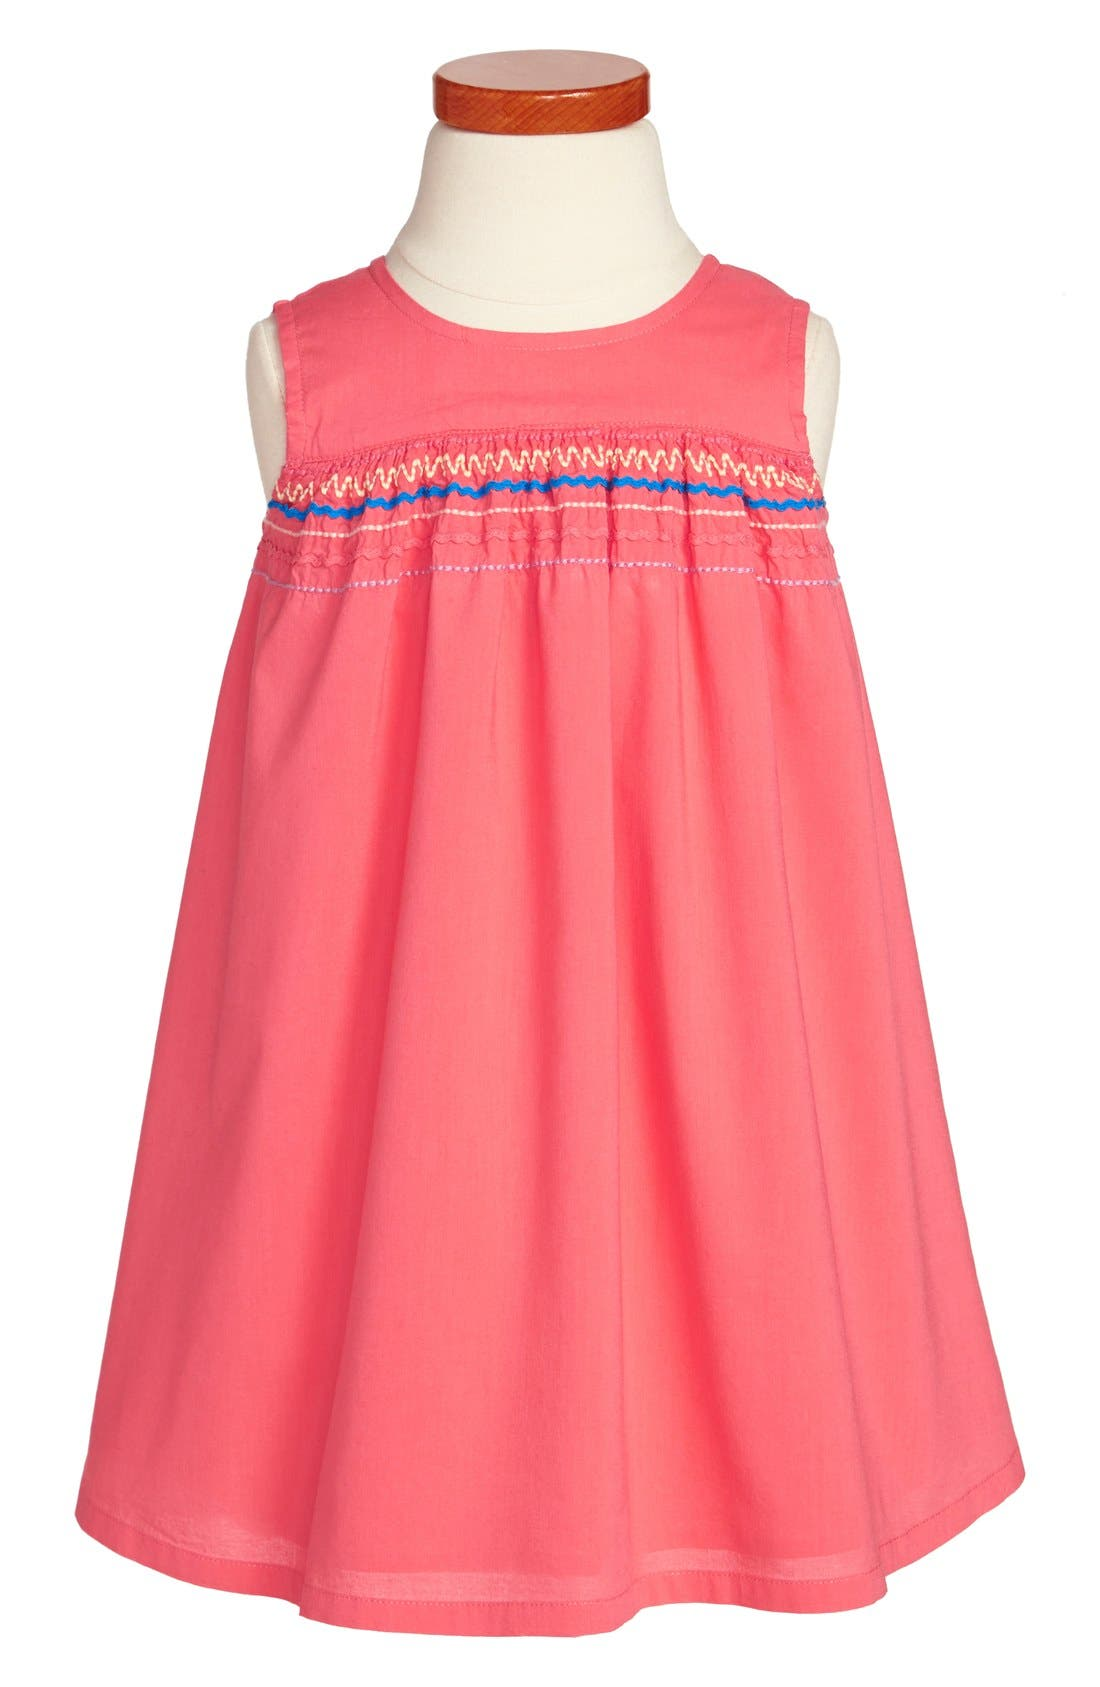 Main Image - Tucker + Tate 'Lynn' Dress (Little Girls & Big Girls)